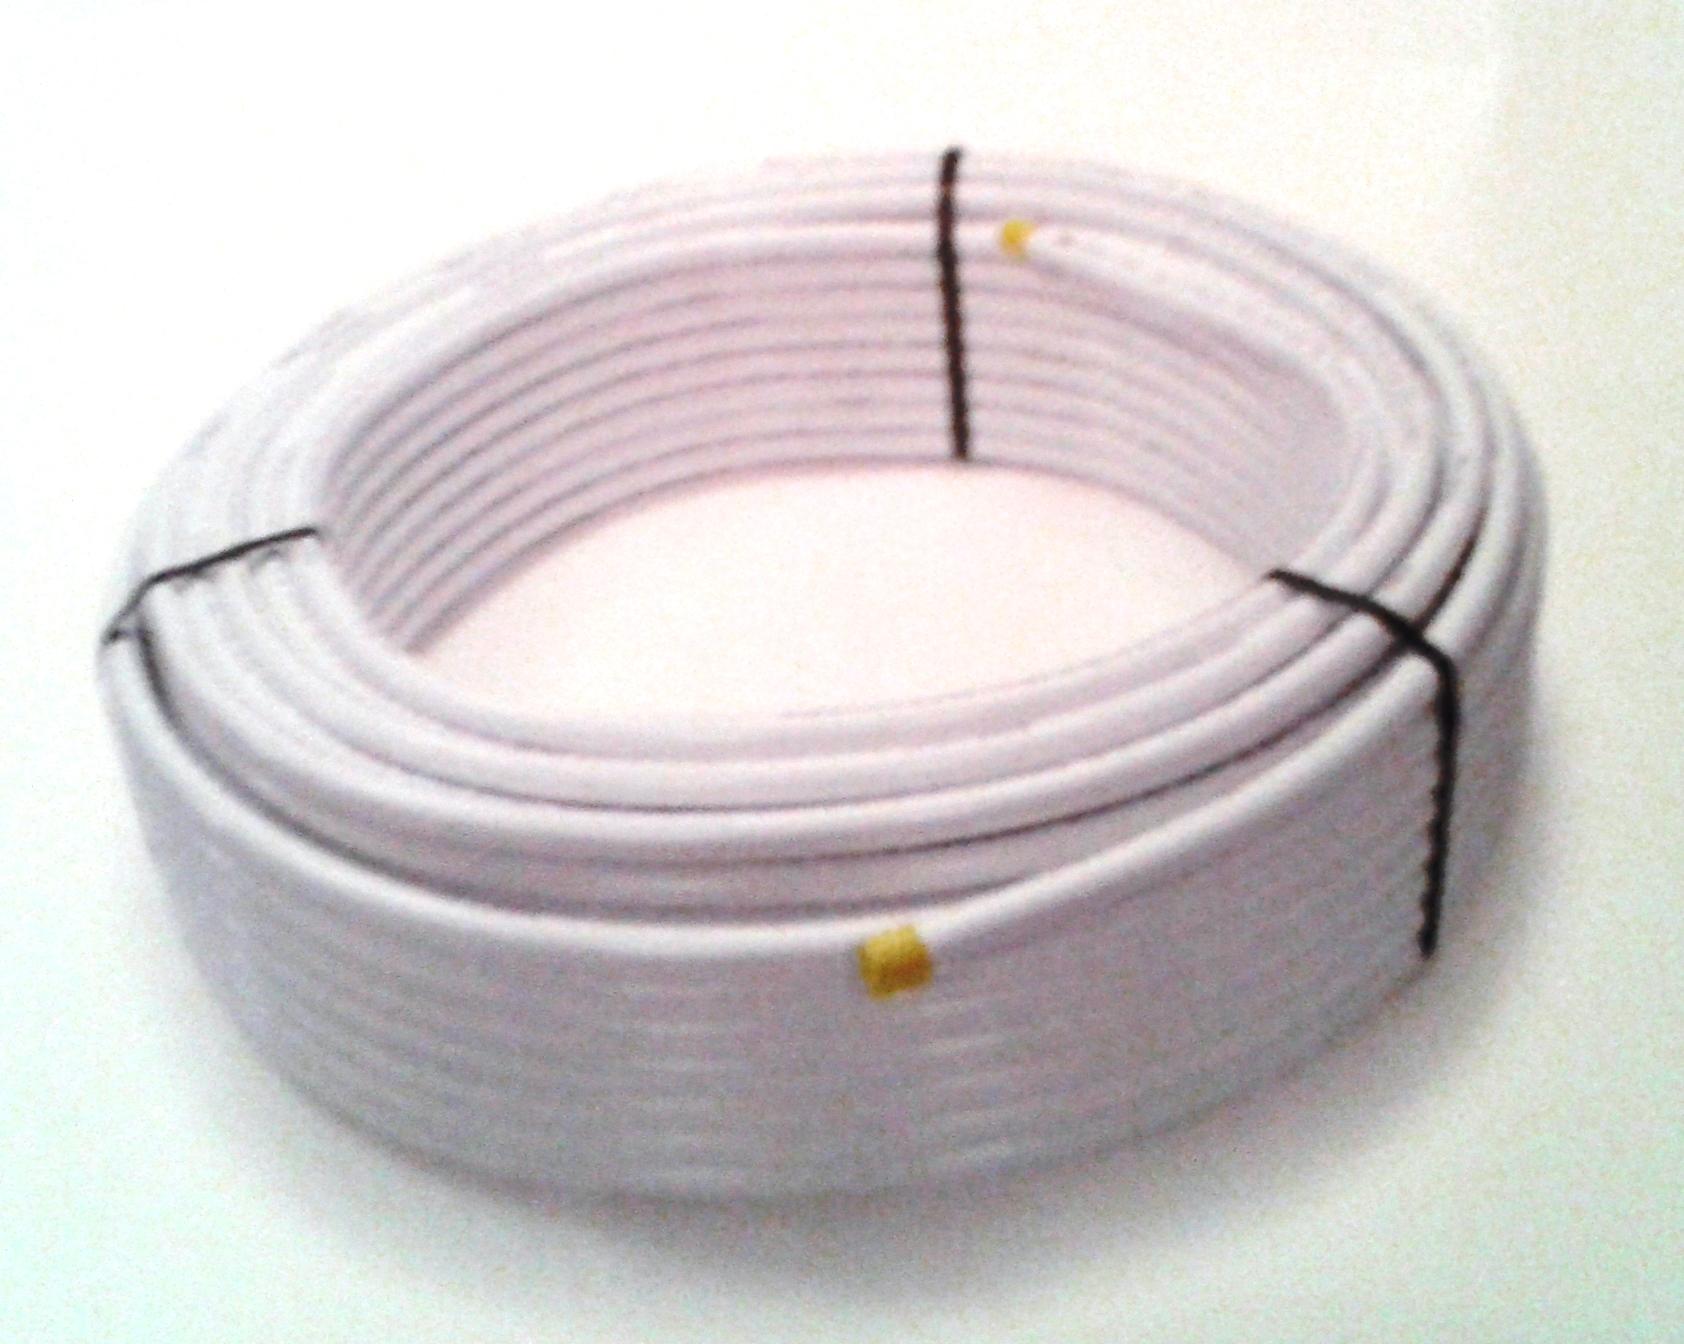 25m Aluminium Mehrschichtverbundrohr Rolle 26x3mm 26x3mm 26x3mm für Heizung Sanitär (/m) a95aec